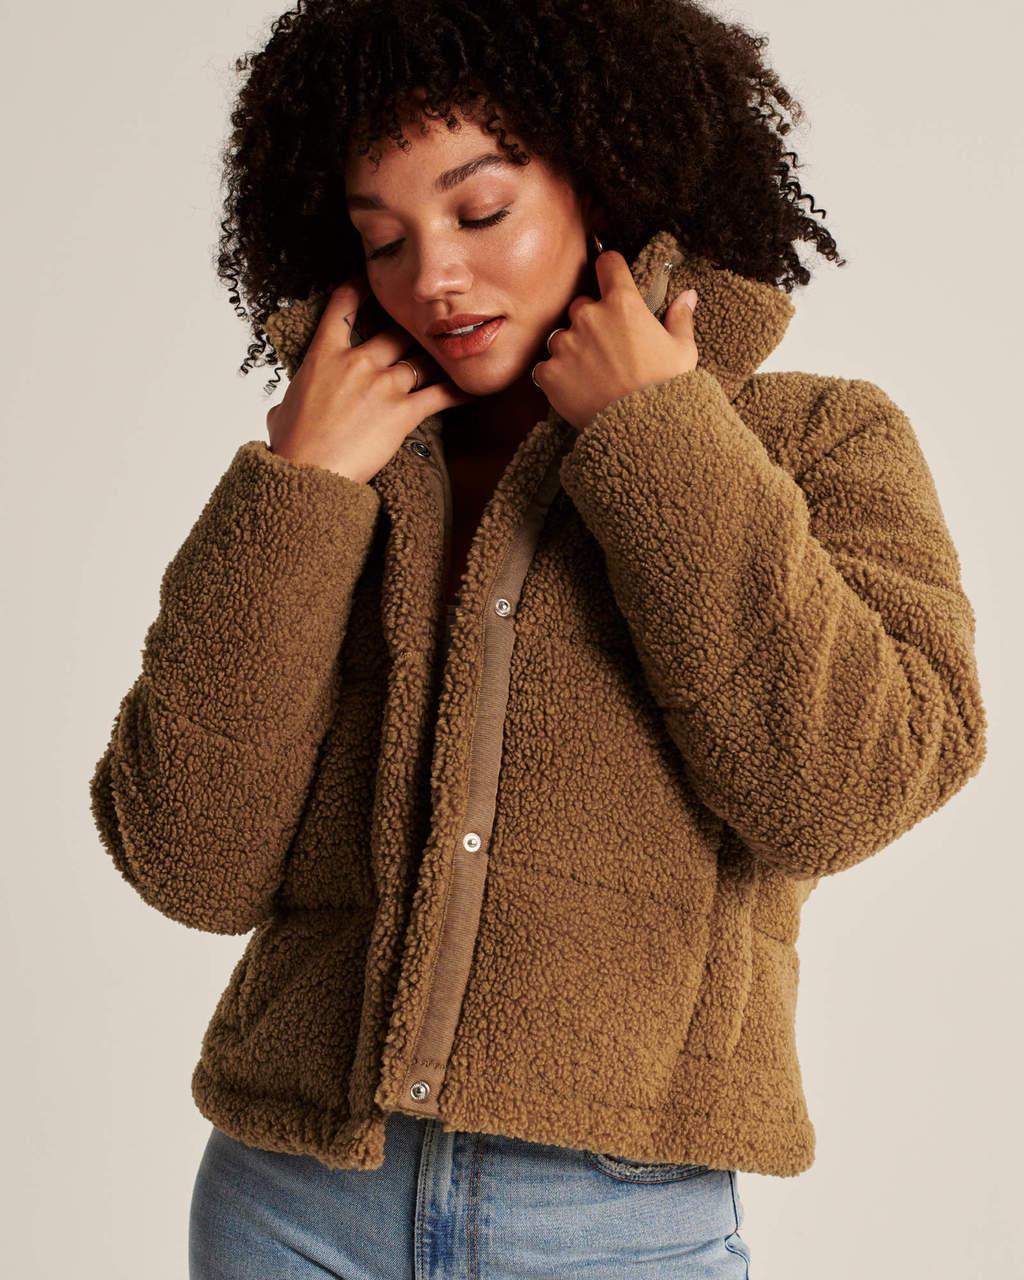 Abercrombie & Fitch Sherpa Mini Puffer Jacket